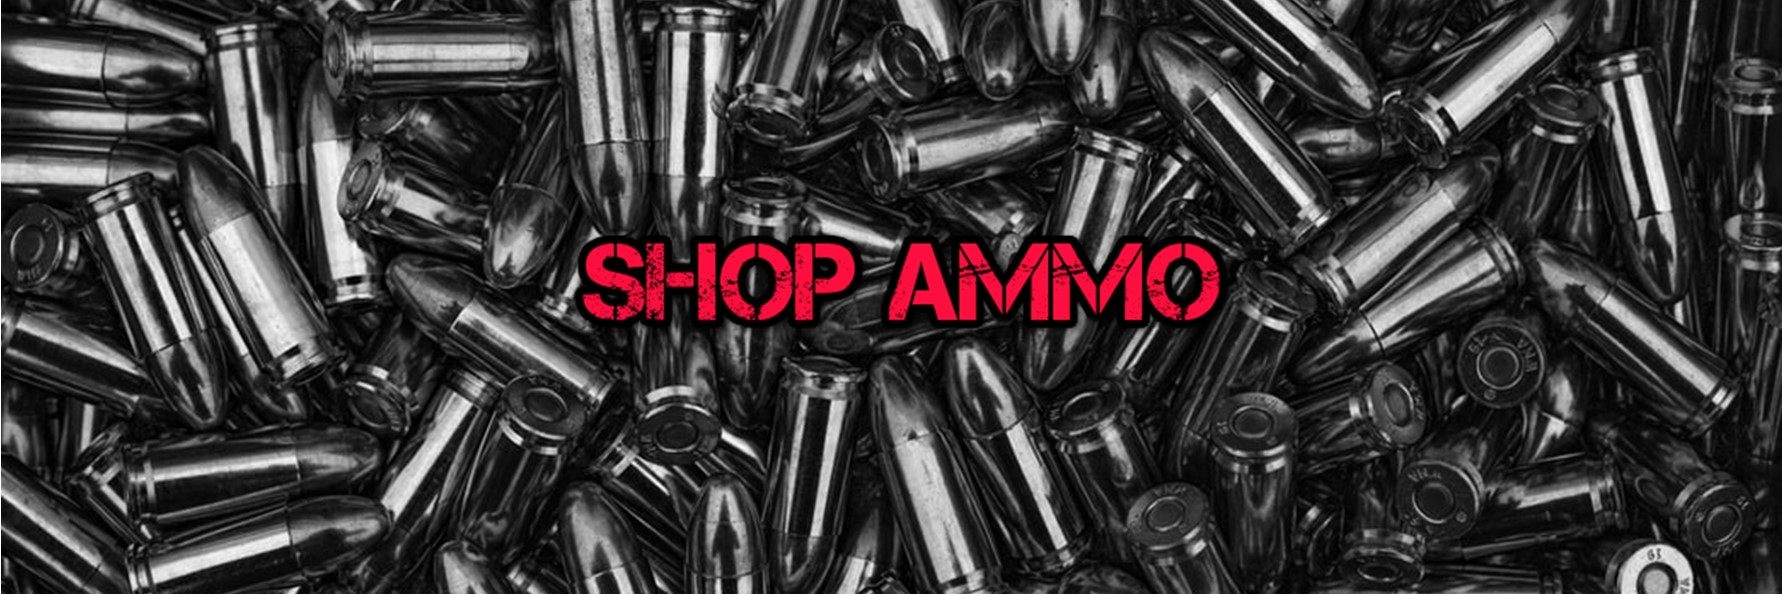 https://patriot-quartermaster-llc.ammoreadycloud.com/catalog/ammo/rifle